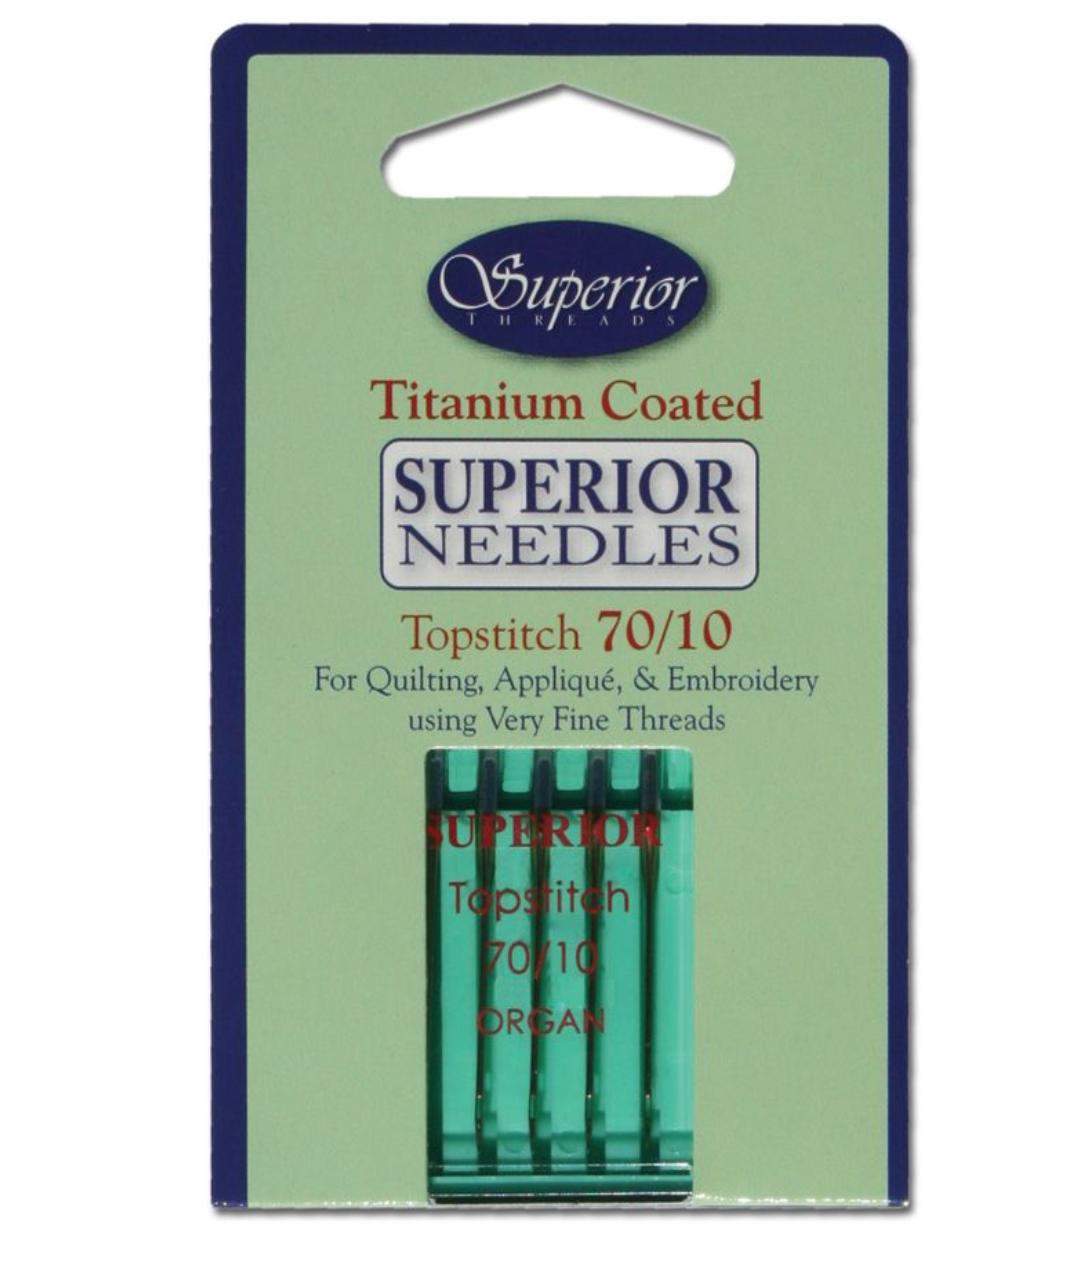 32-70-10 topstitch needles 70/10